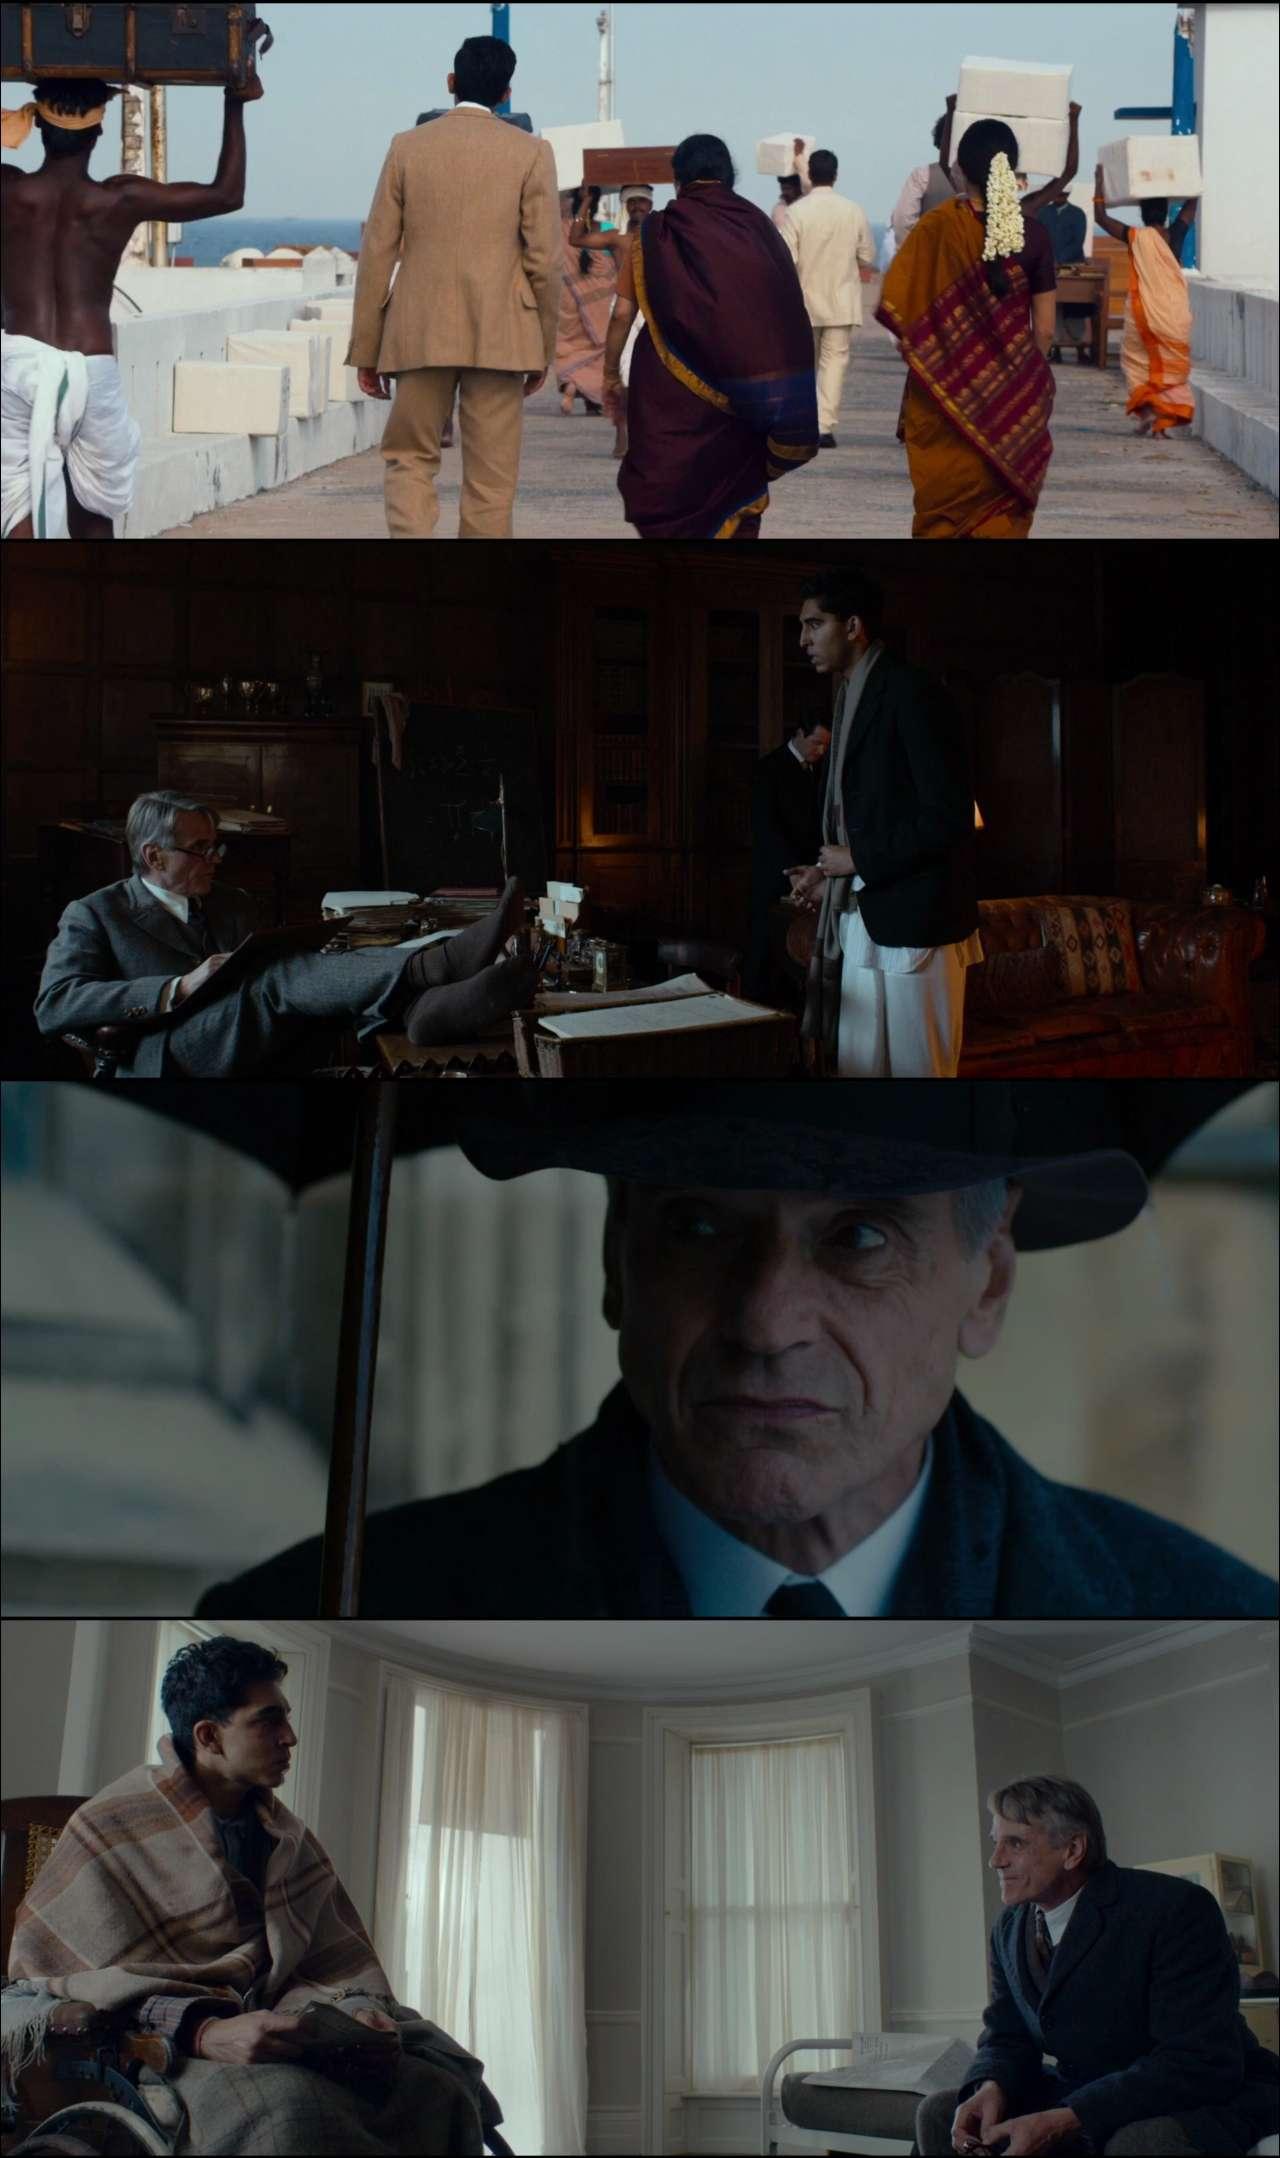 Sonsuzluk Teorisi - The Man Who Knew Infinity (2015) hd türkçe dublaj film indir